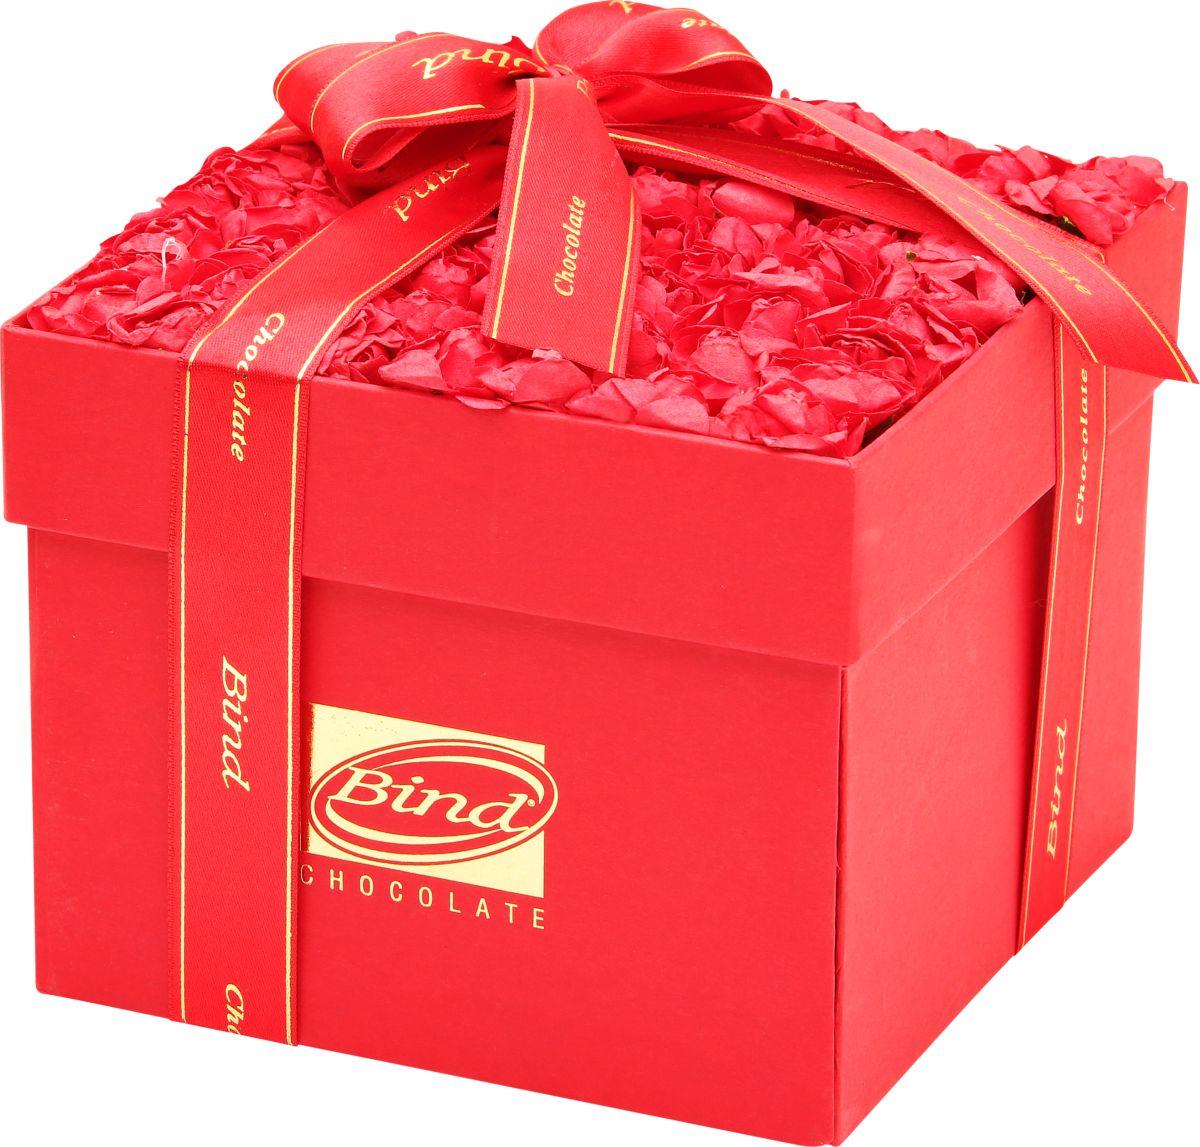 Bind Сюрприз набор шоколадных конфет, 360 г 360 degree rotating protective litchi pattern case w stand for google nexus 7 ii chocolate